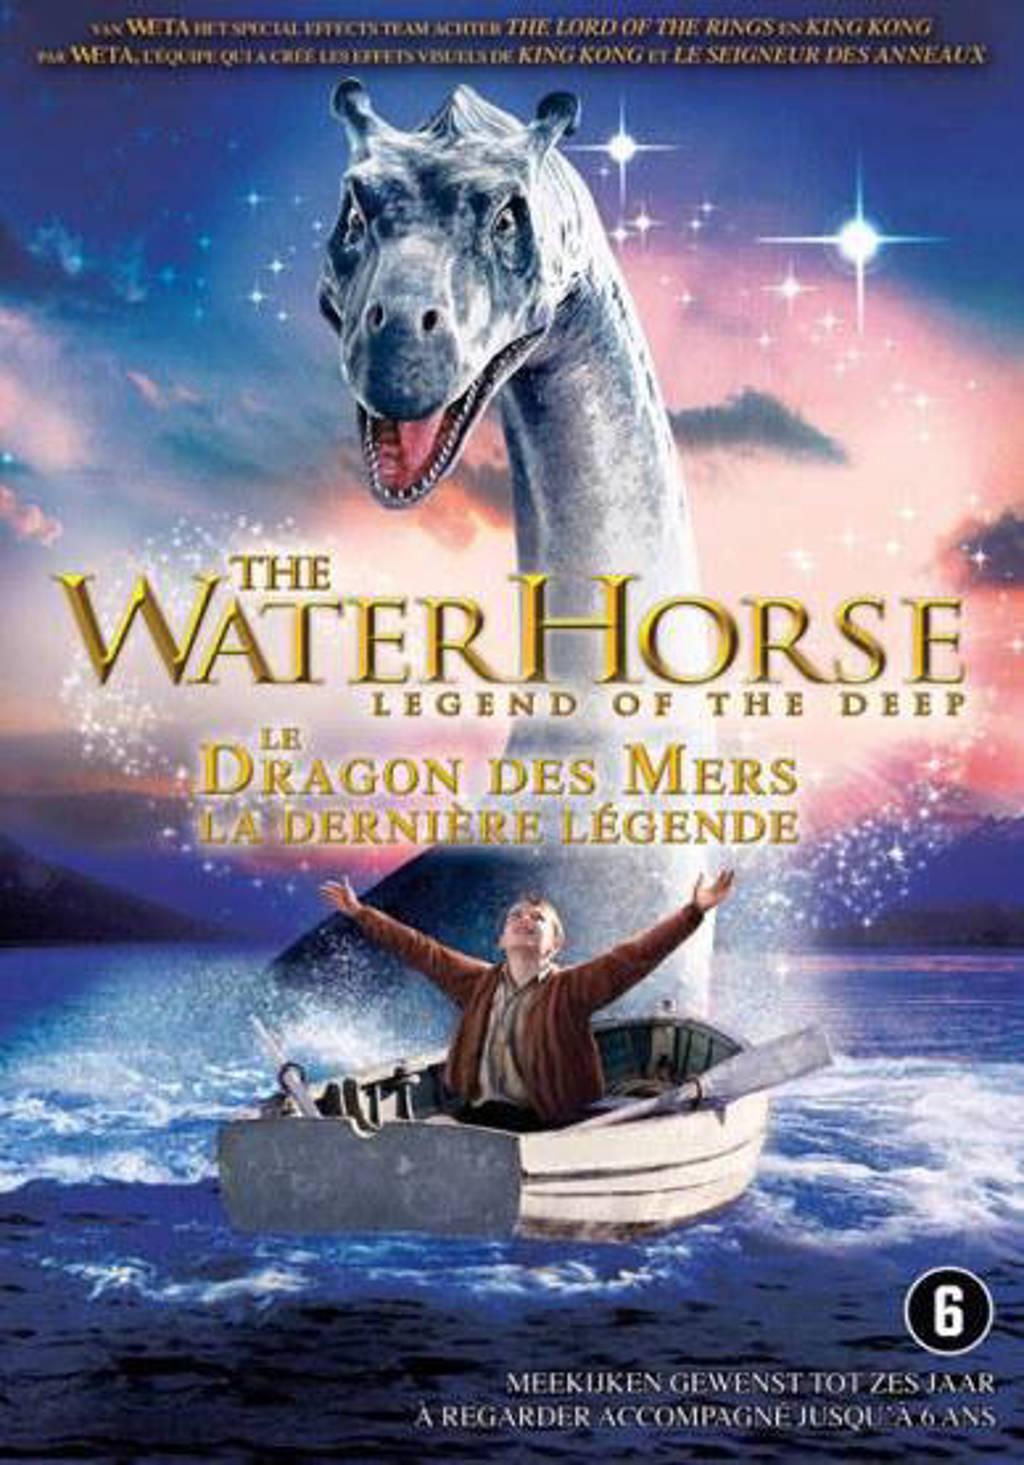 Water horse-legend of the deep (DVD)